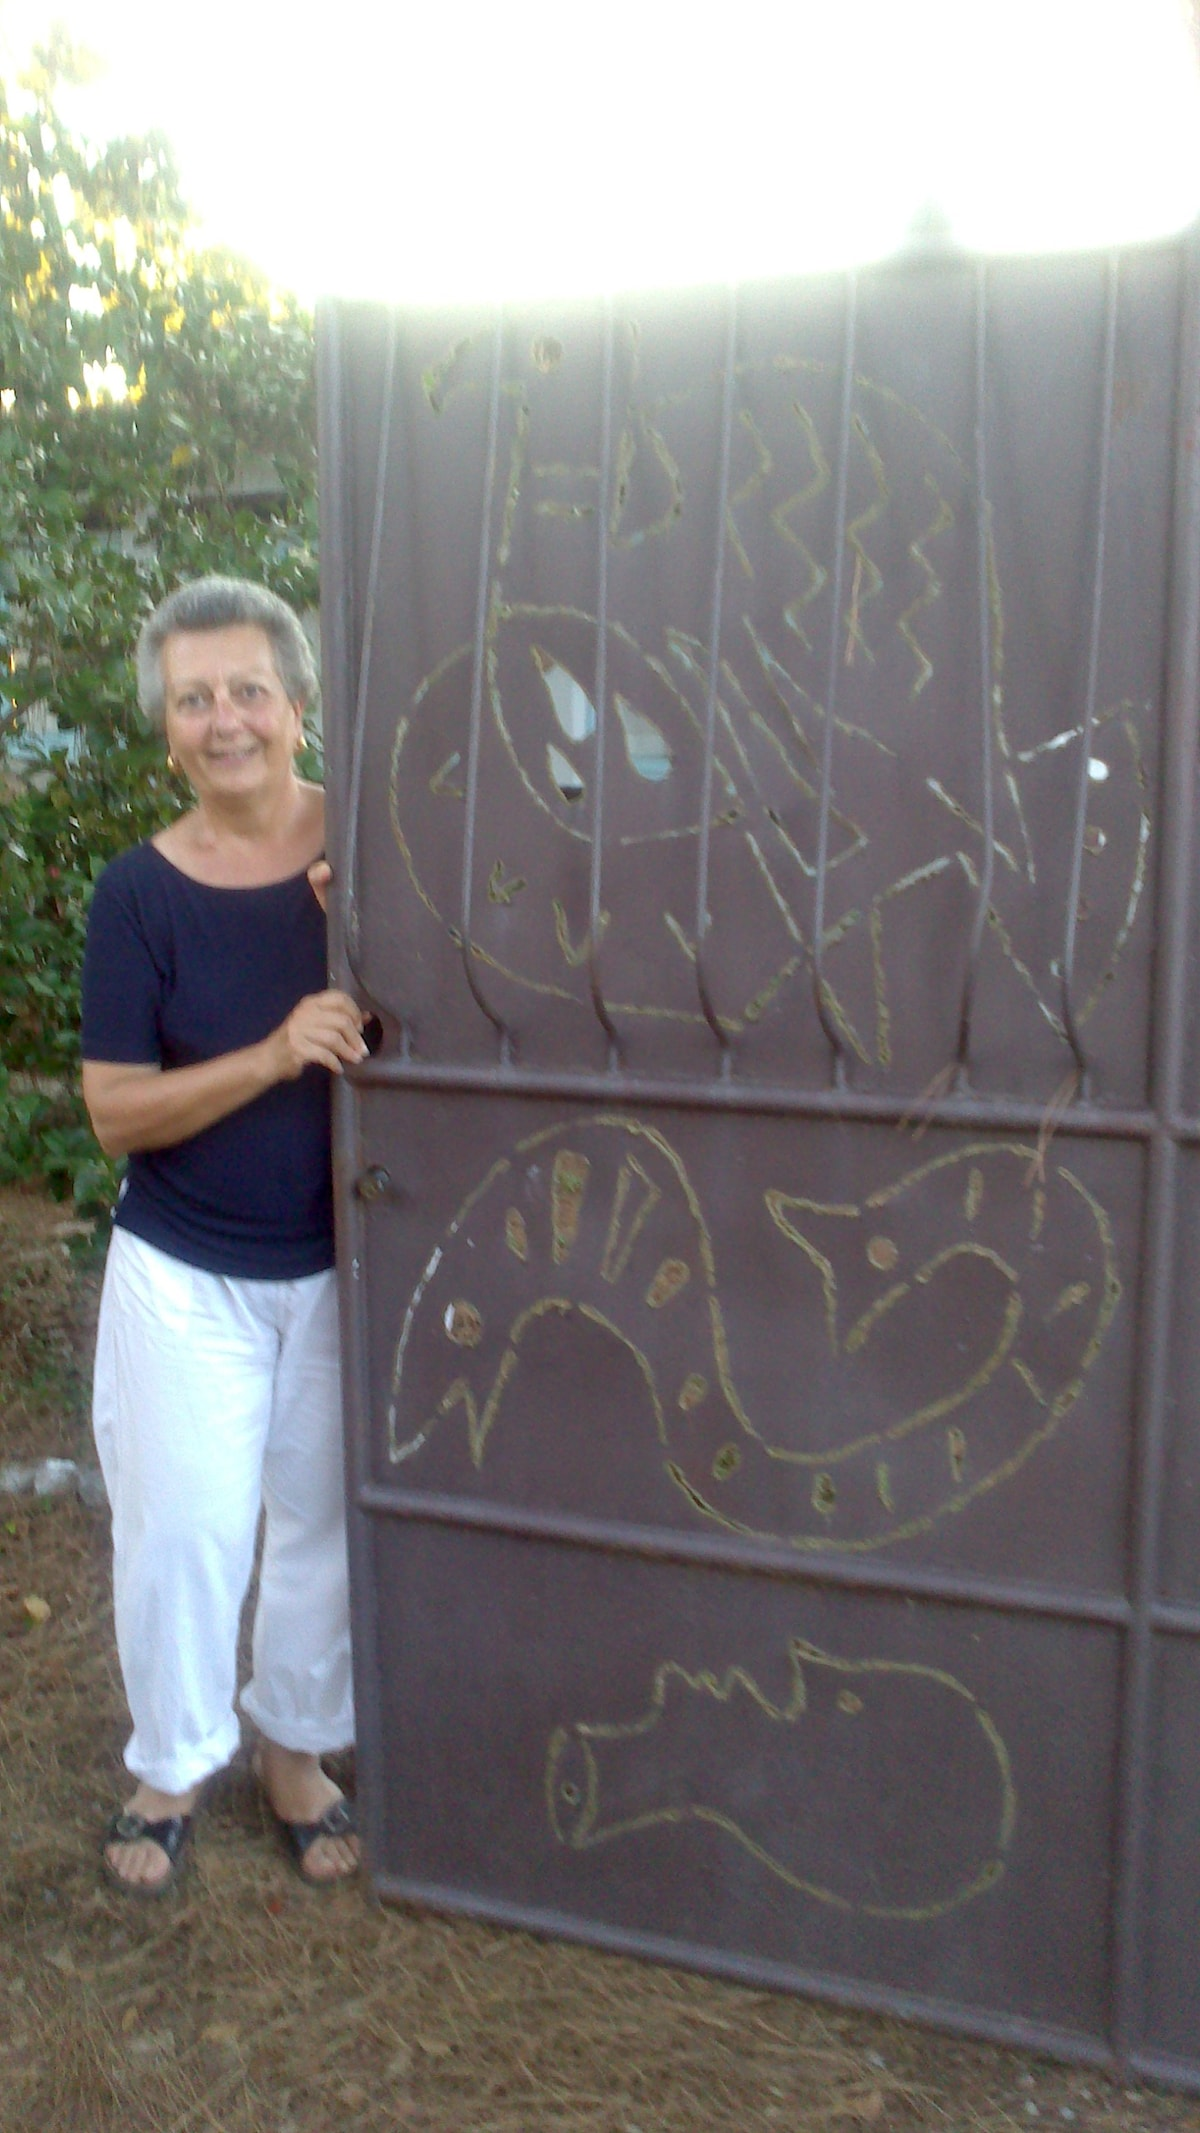 Corinna From Viareggio, Italy